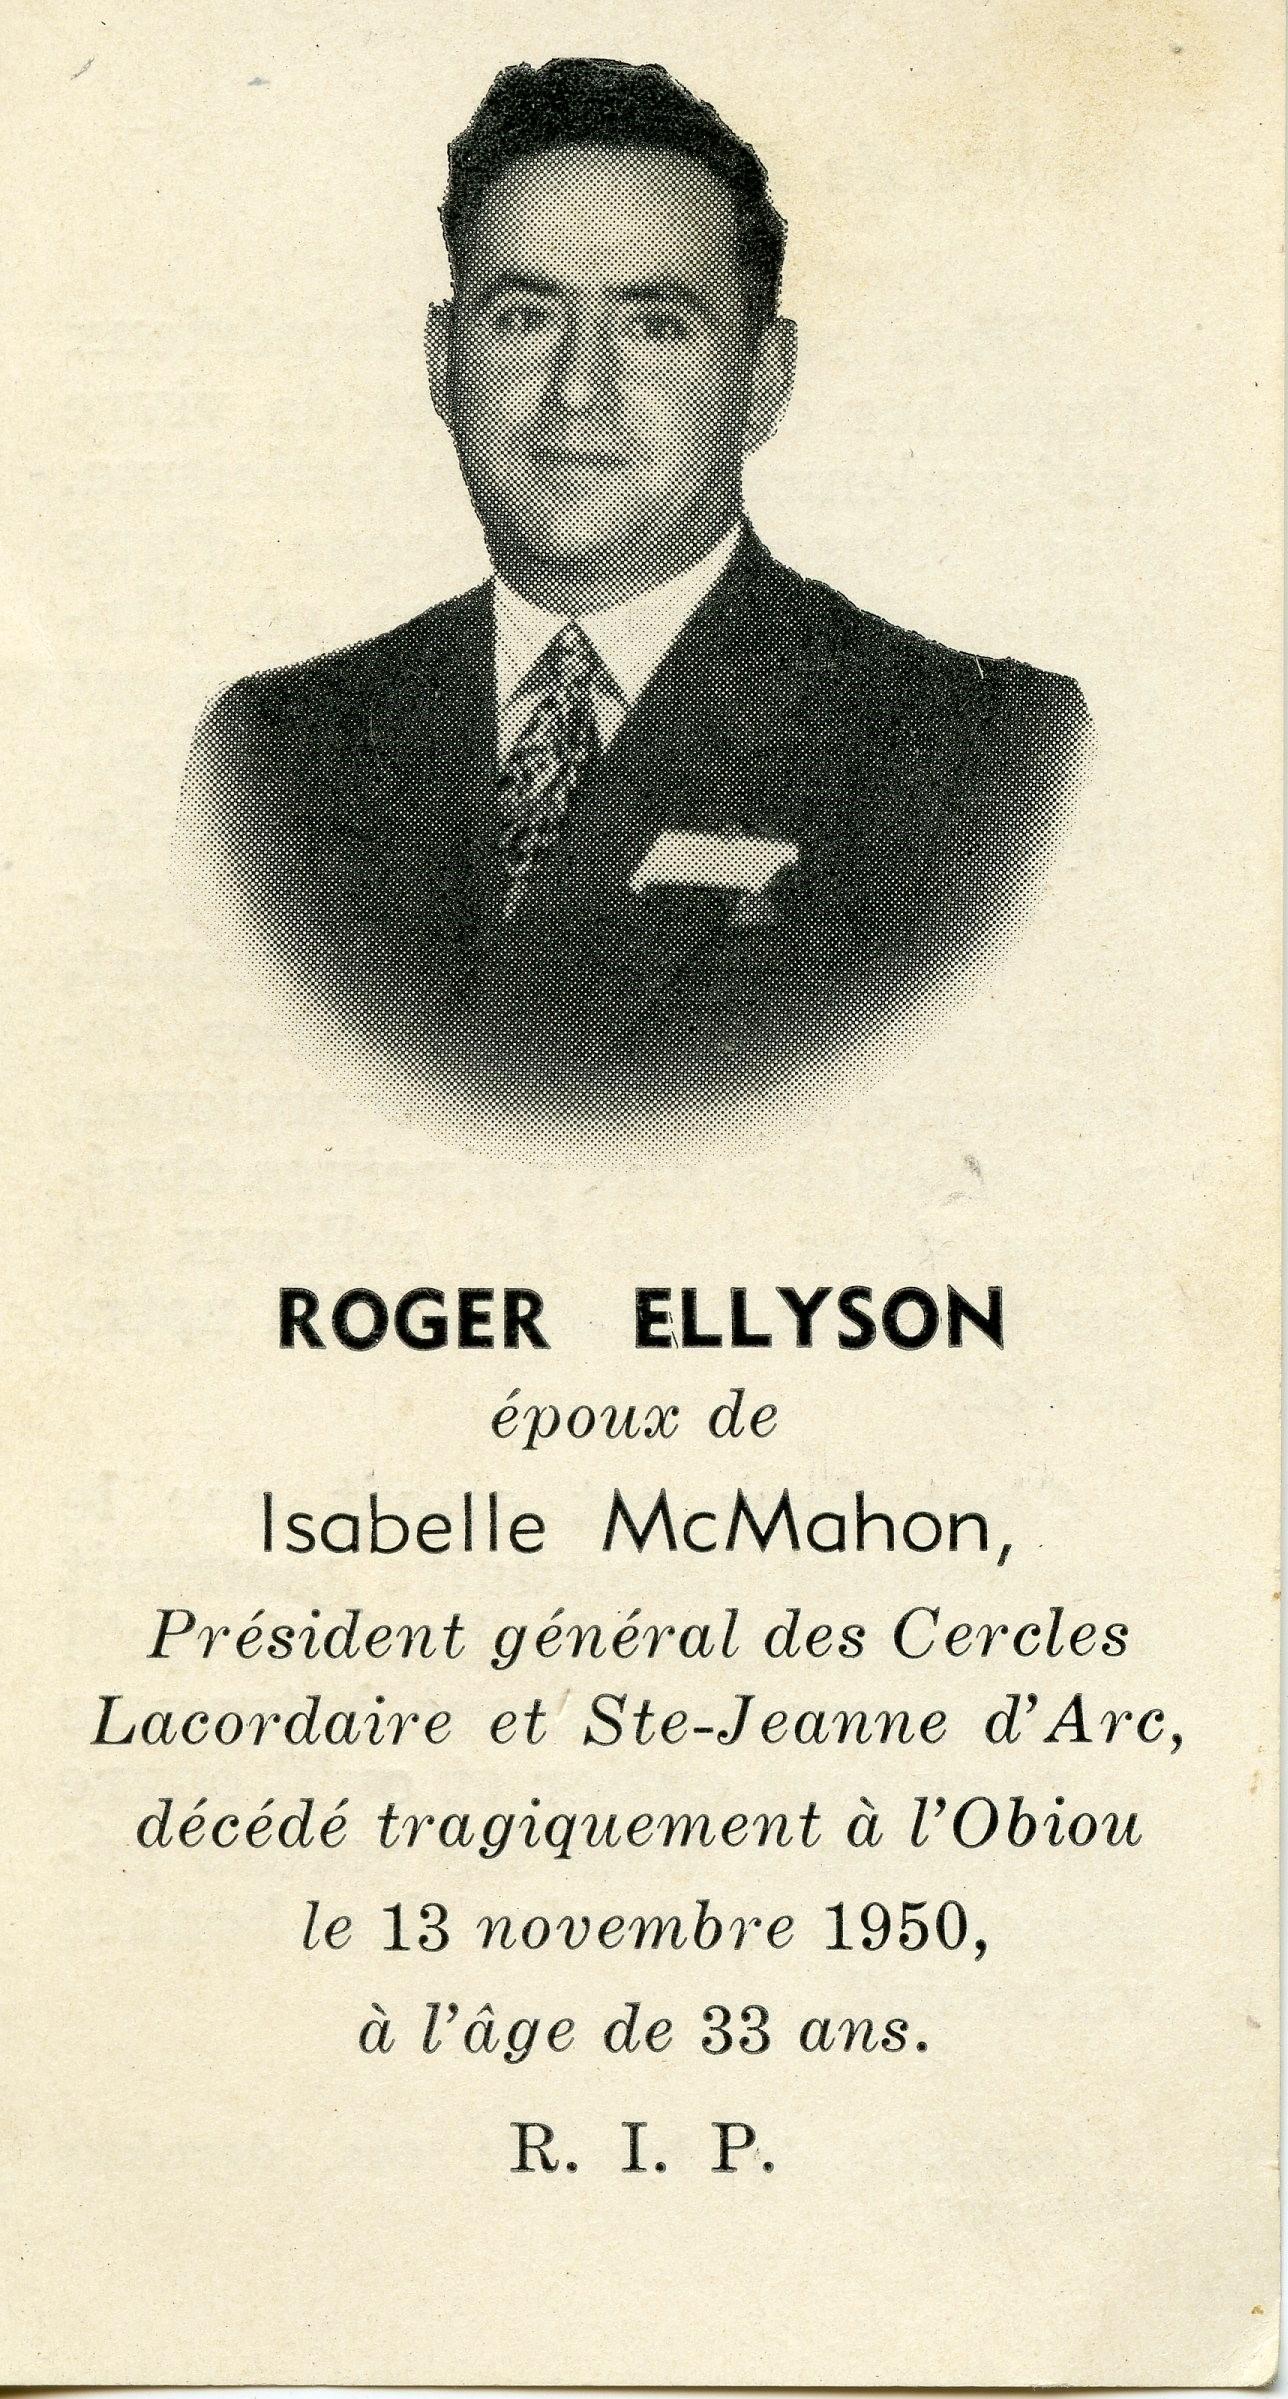 Roger Ellyson 1933-1950